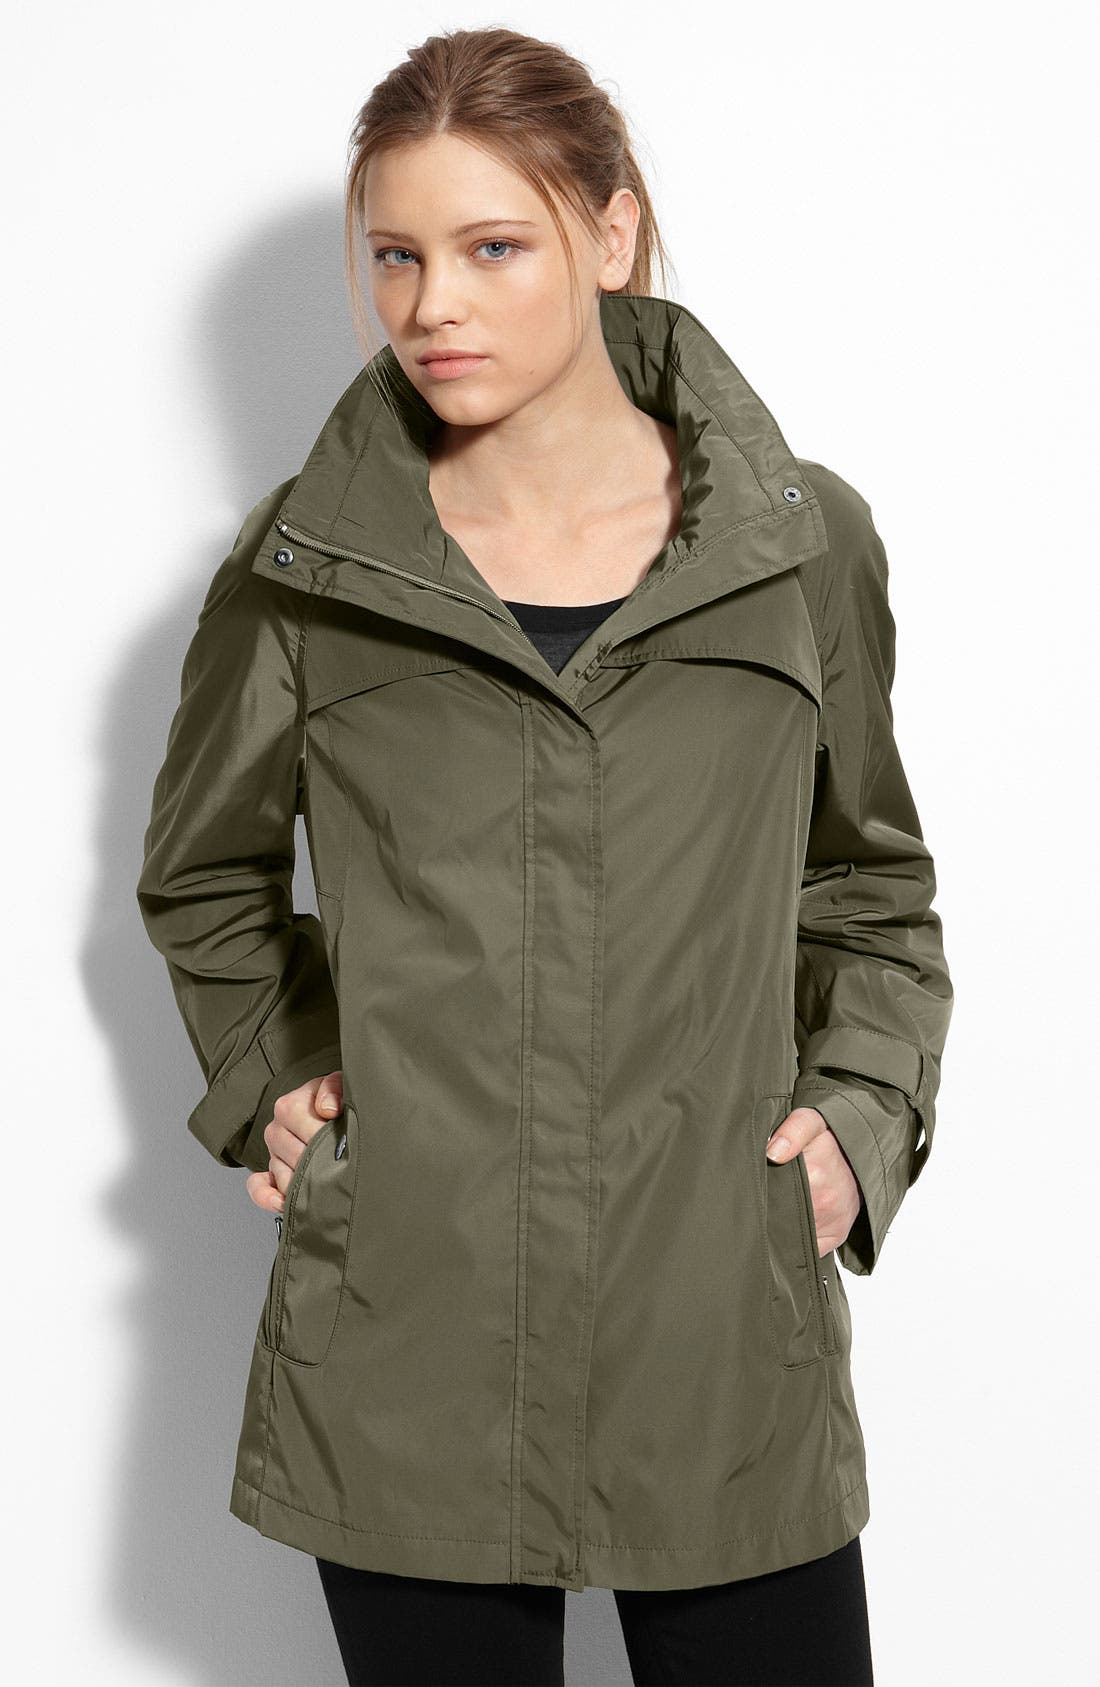 Main Image - Platinum Utex Weatherproof Jacket